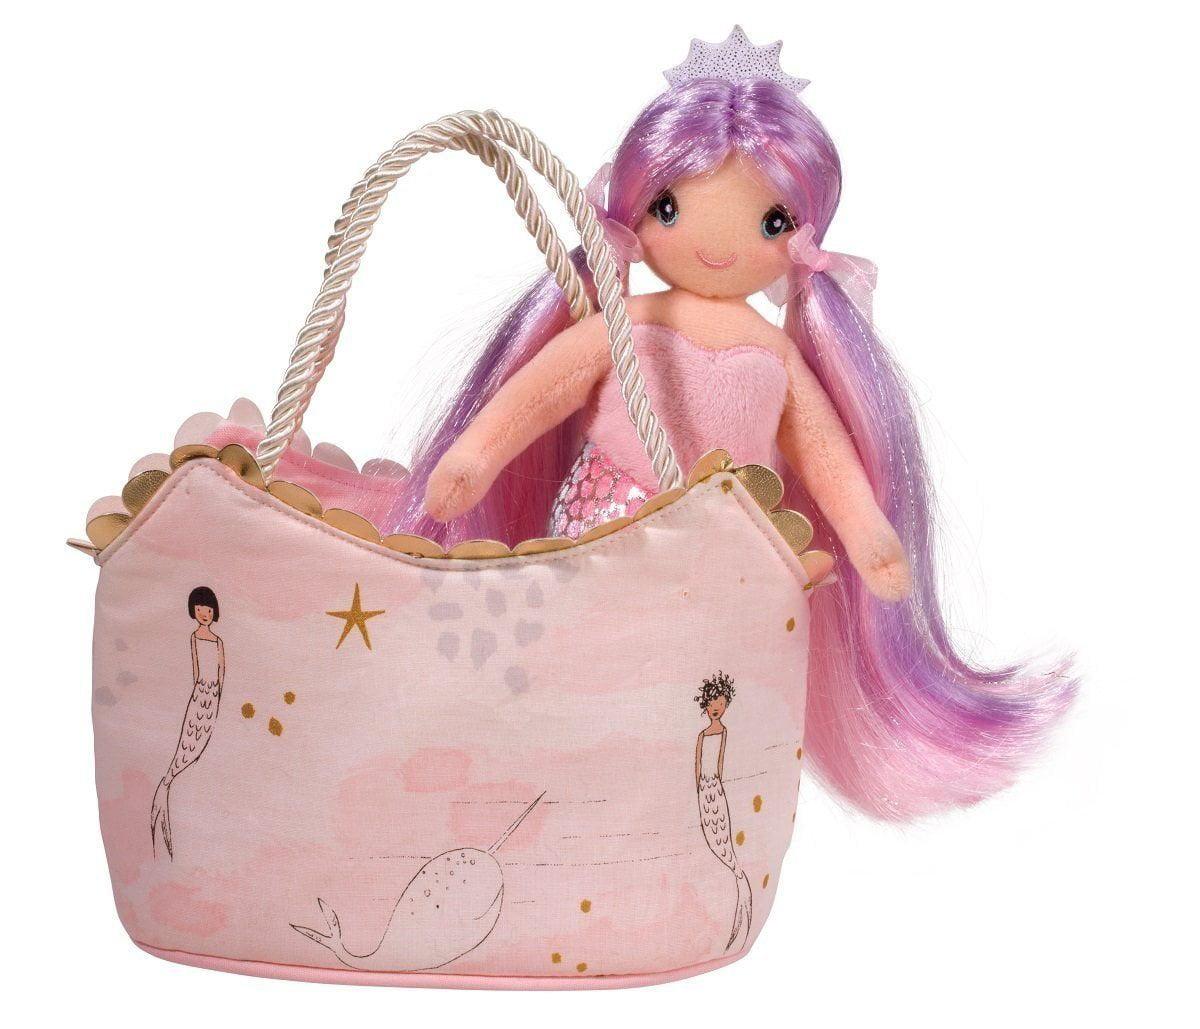 Douglas Sassy Pet Sak Pink Mermaid, By Douglas Toys by